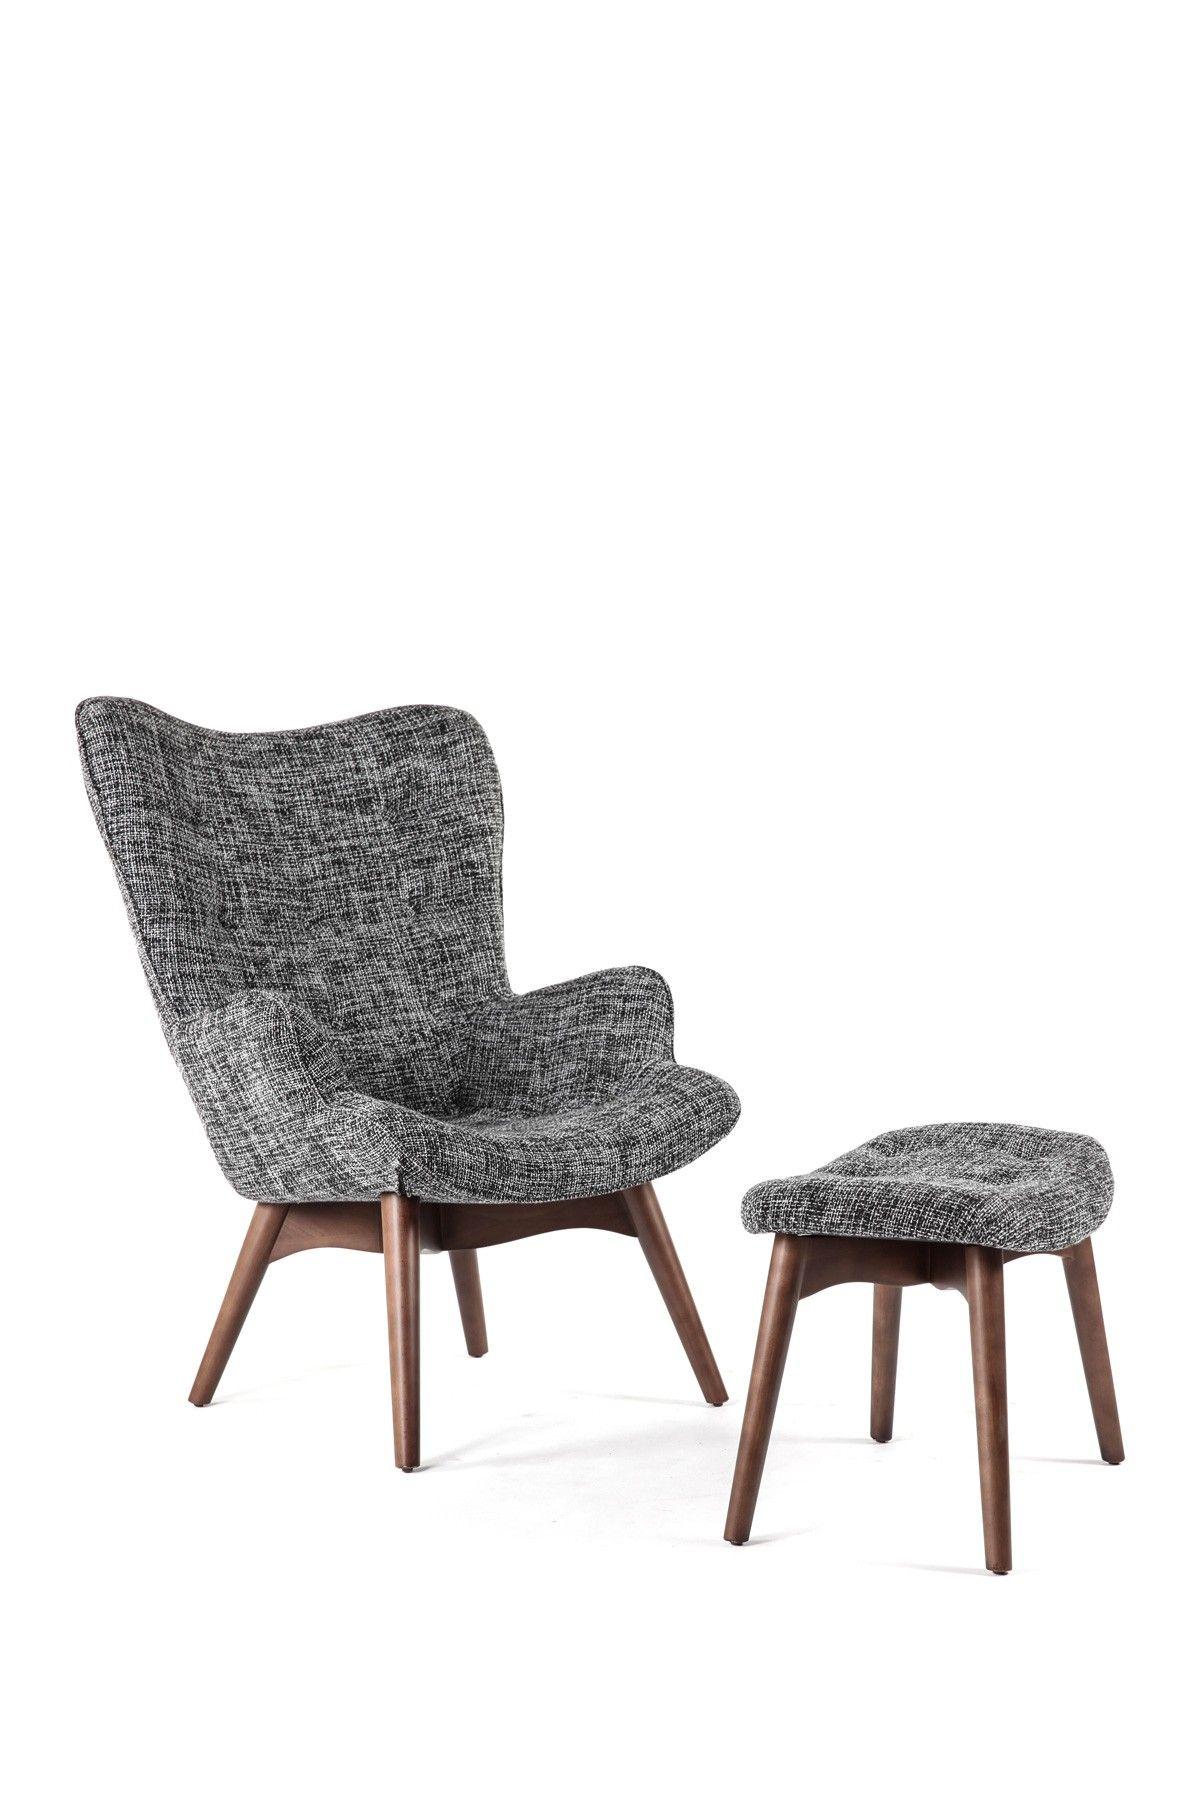 Control Brand The Teddy Twill Black Wood Bear Chair With Ottoman S Izobrazheniyami Dizajn Interera Mebel Dizajn